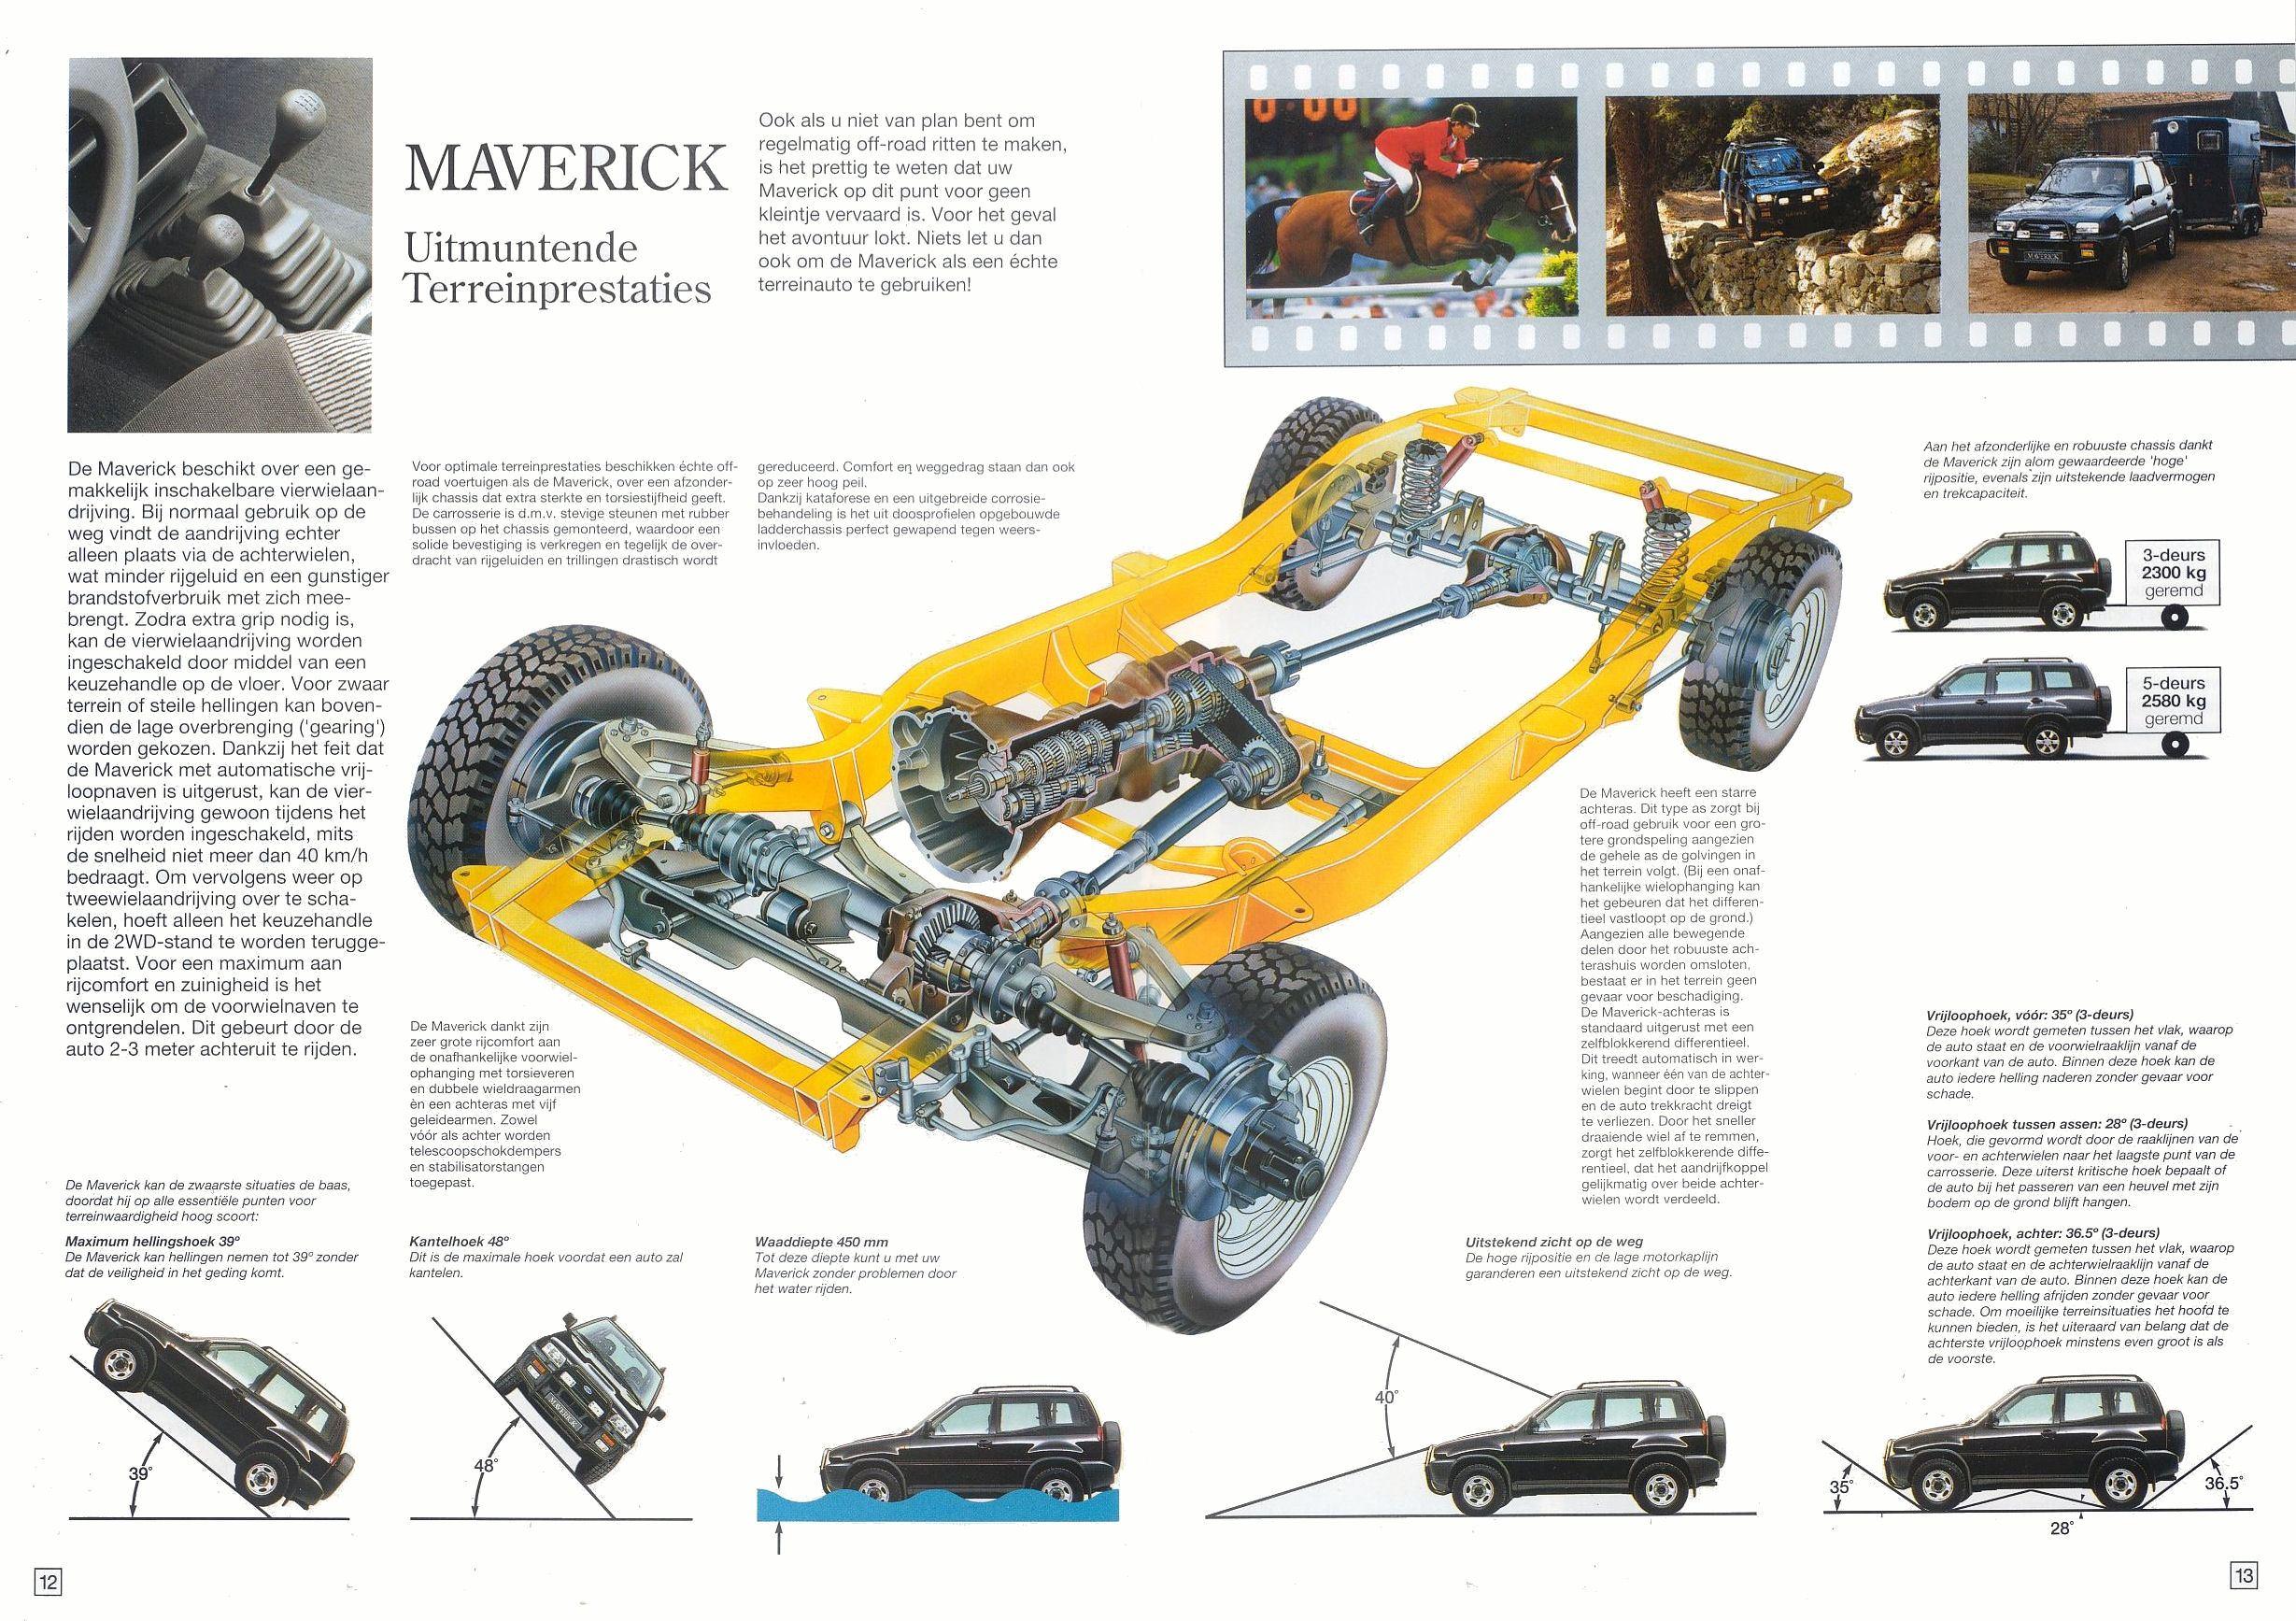 1995 Ford Maverick brochure